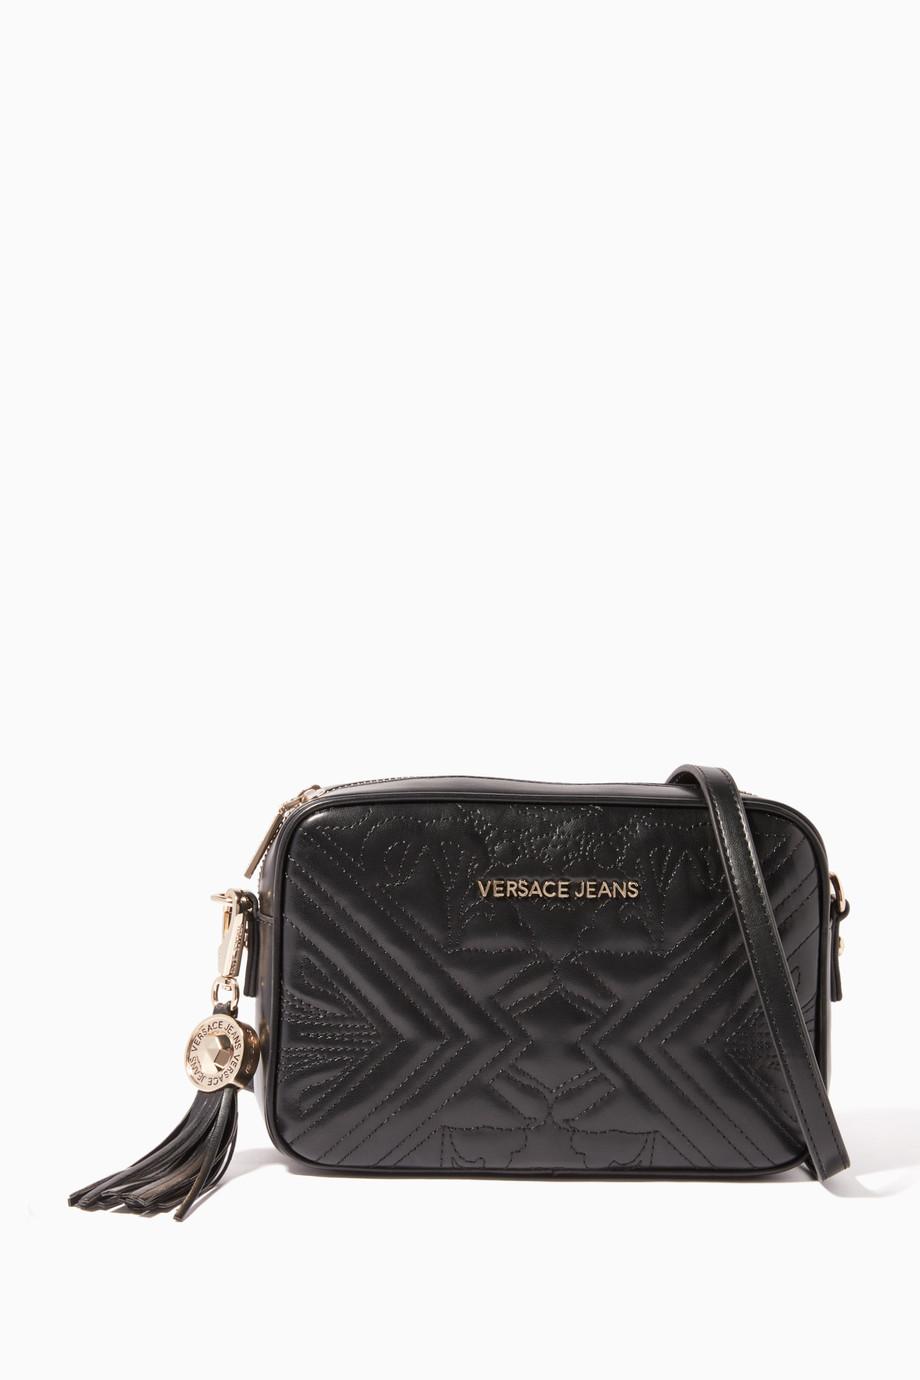 c8c4f35cf9 Shop Versace Jeans Black Embossed Medium Cross-Body Camera ...